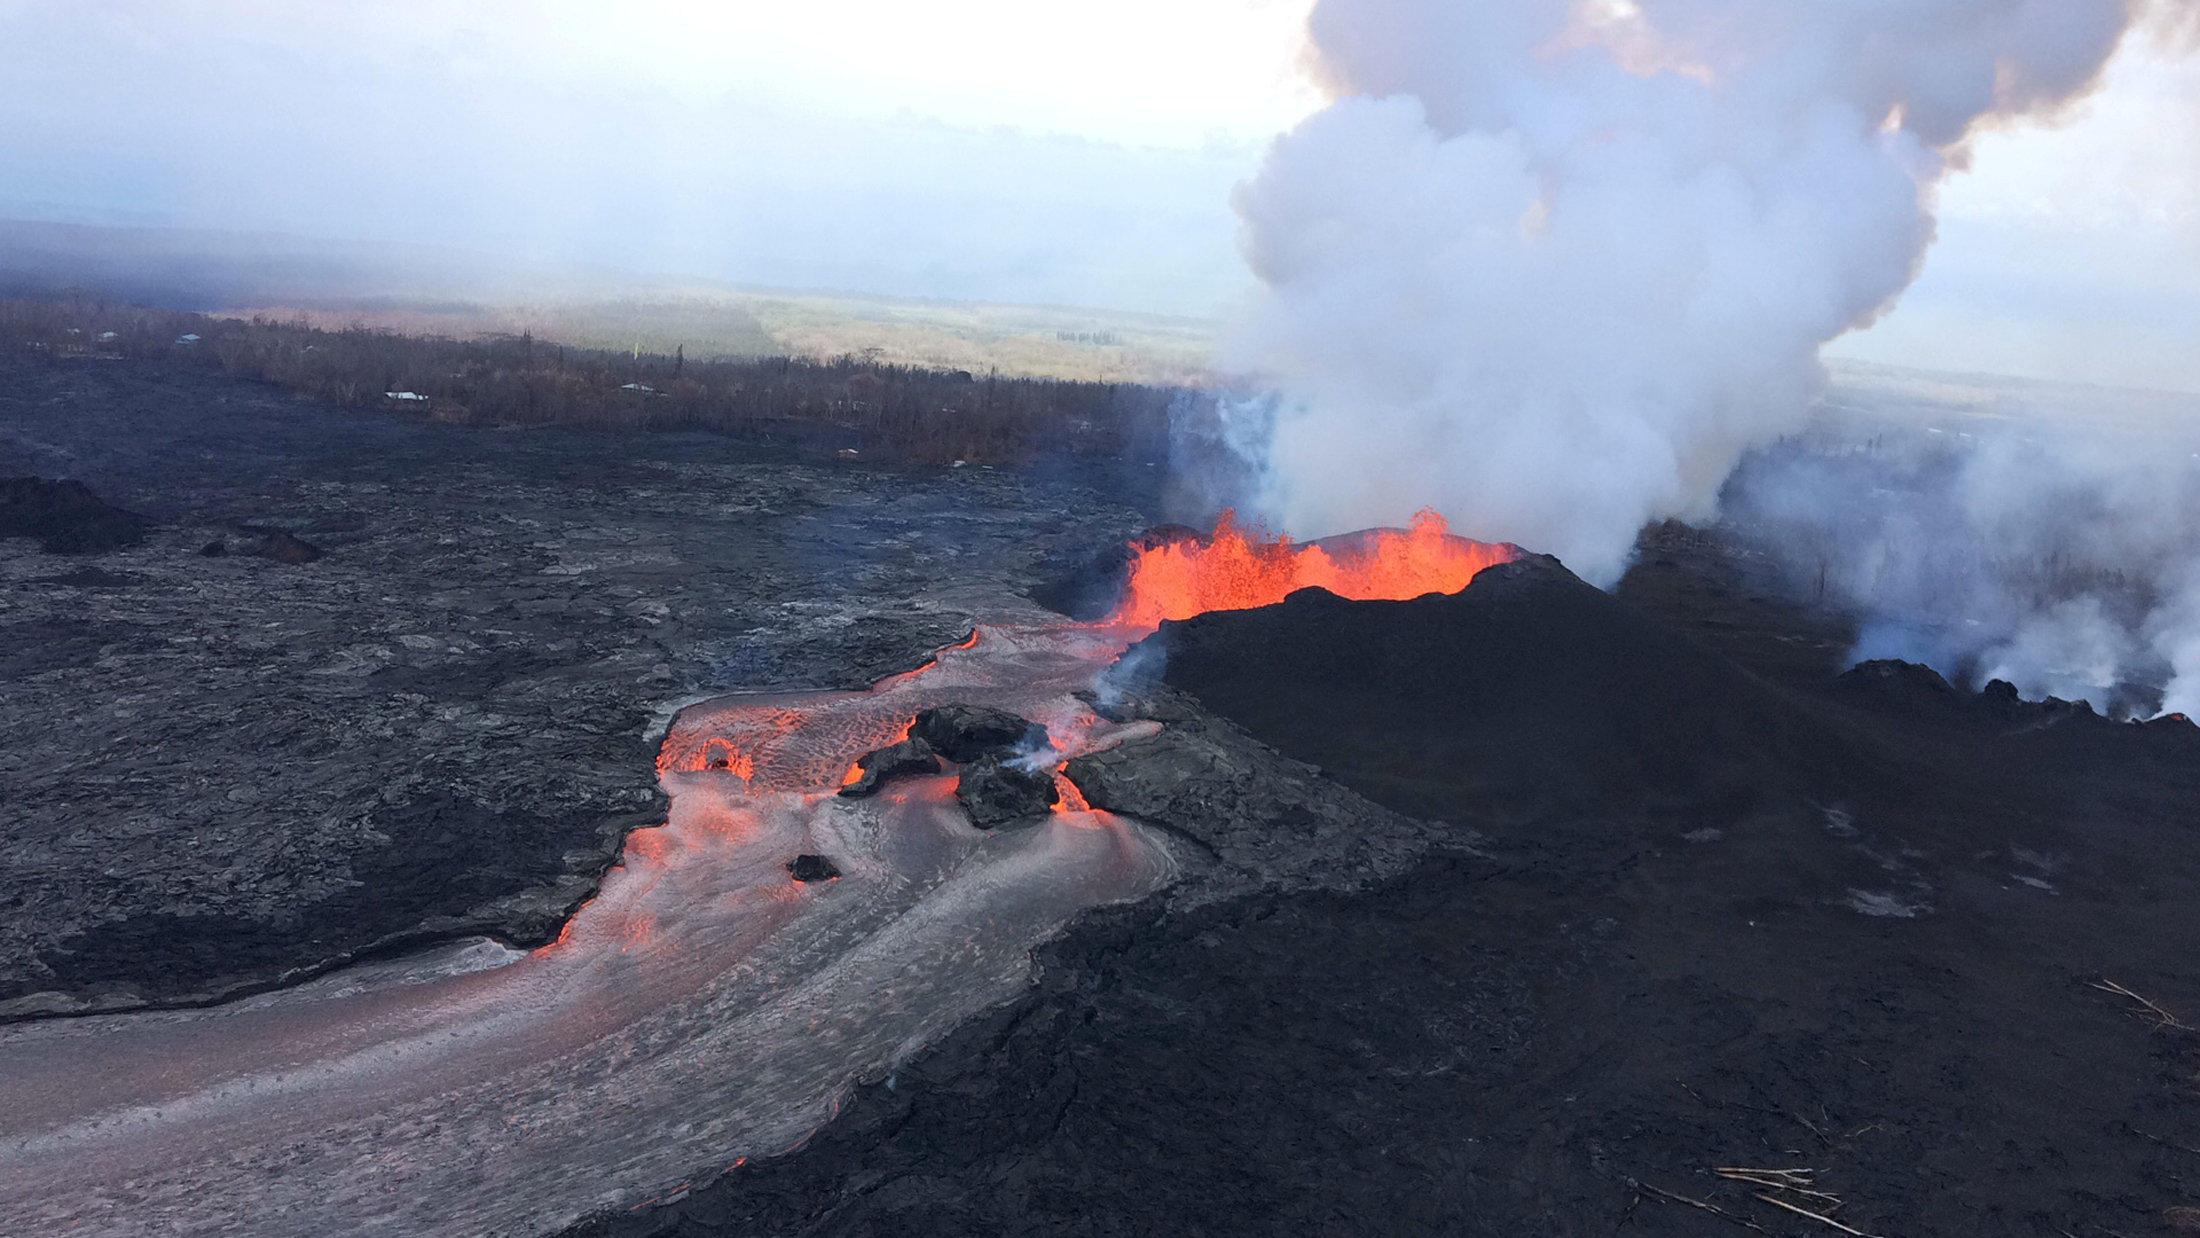 Kilauea Volcano Eruption Seismic Activity Increases Earthquakes Strike 5 Days In A Row